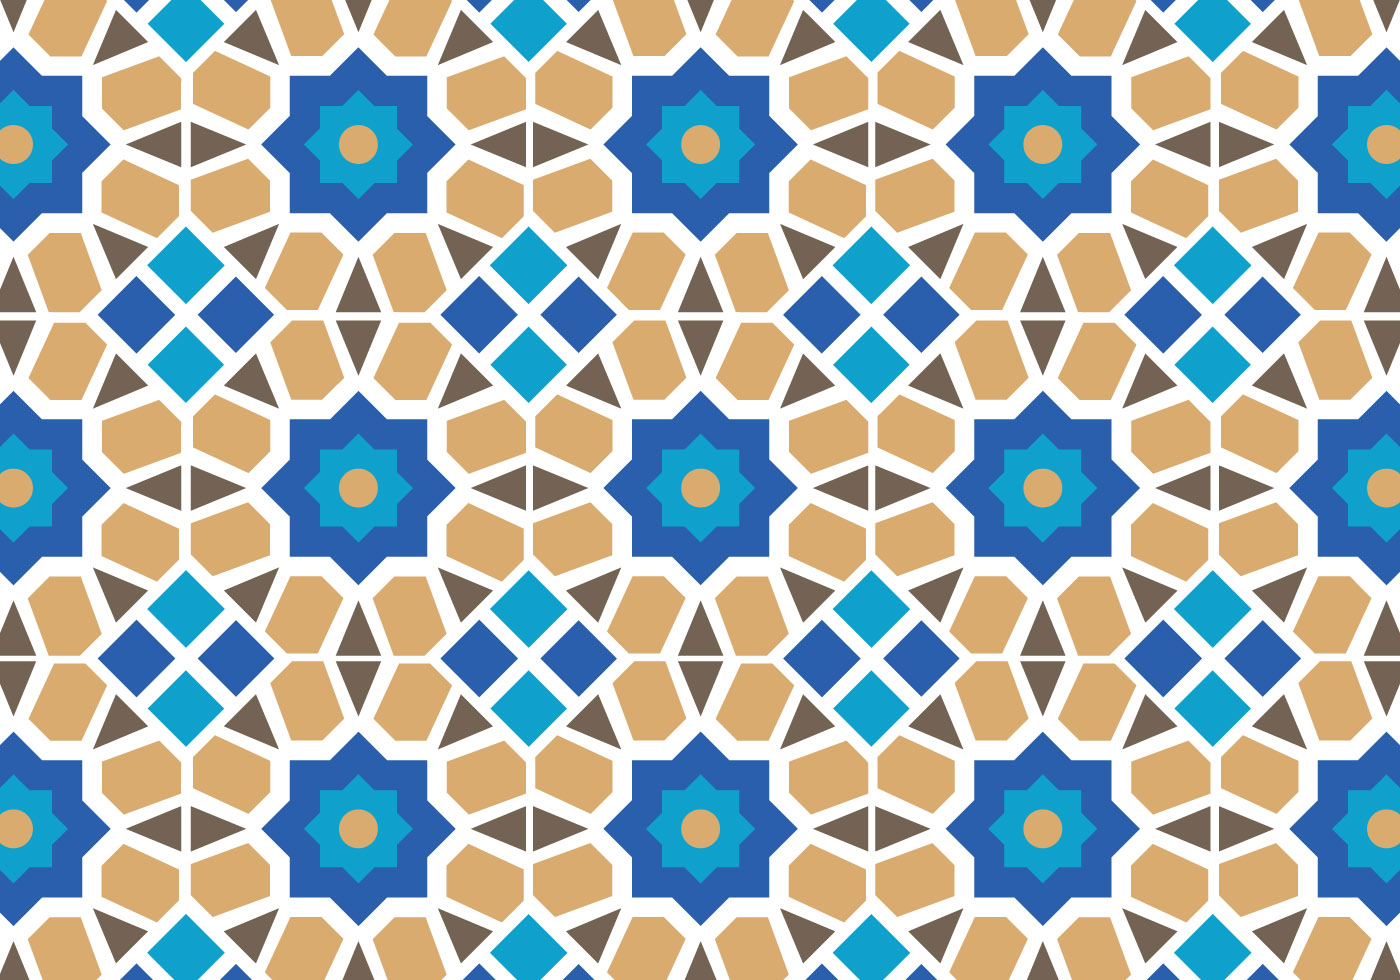 Maroc Tiles - Download Free Vector Art, Stock Graphics & Images